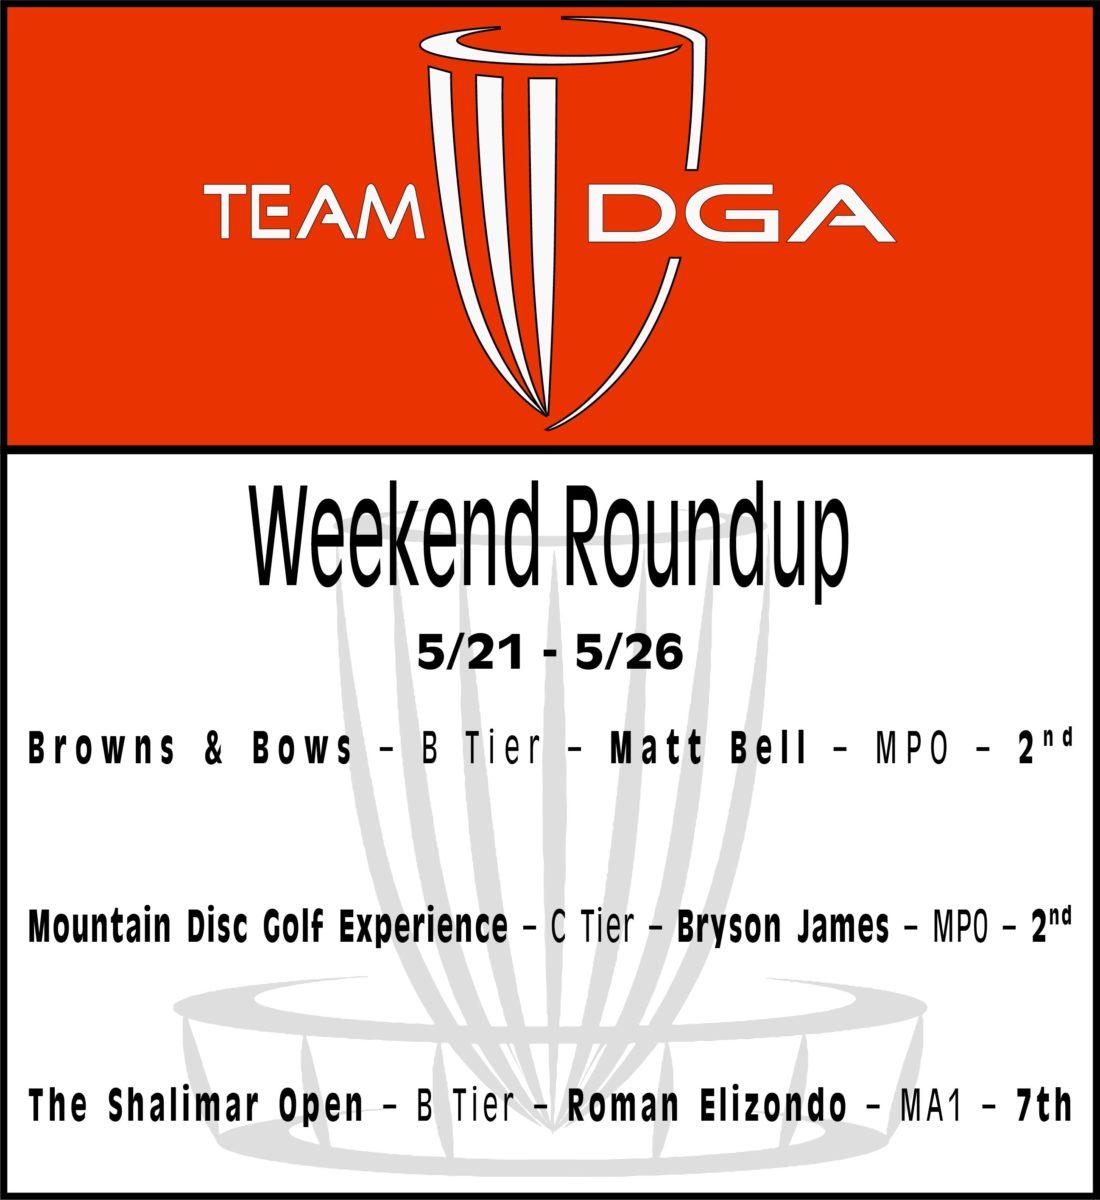 Team DGA Weekend Roundup 5/21 - 5/26